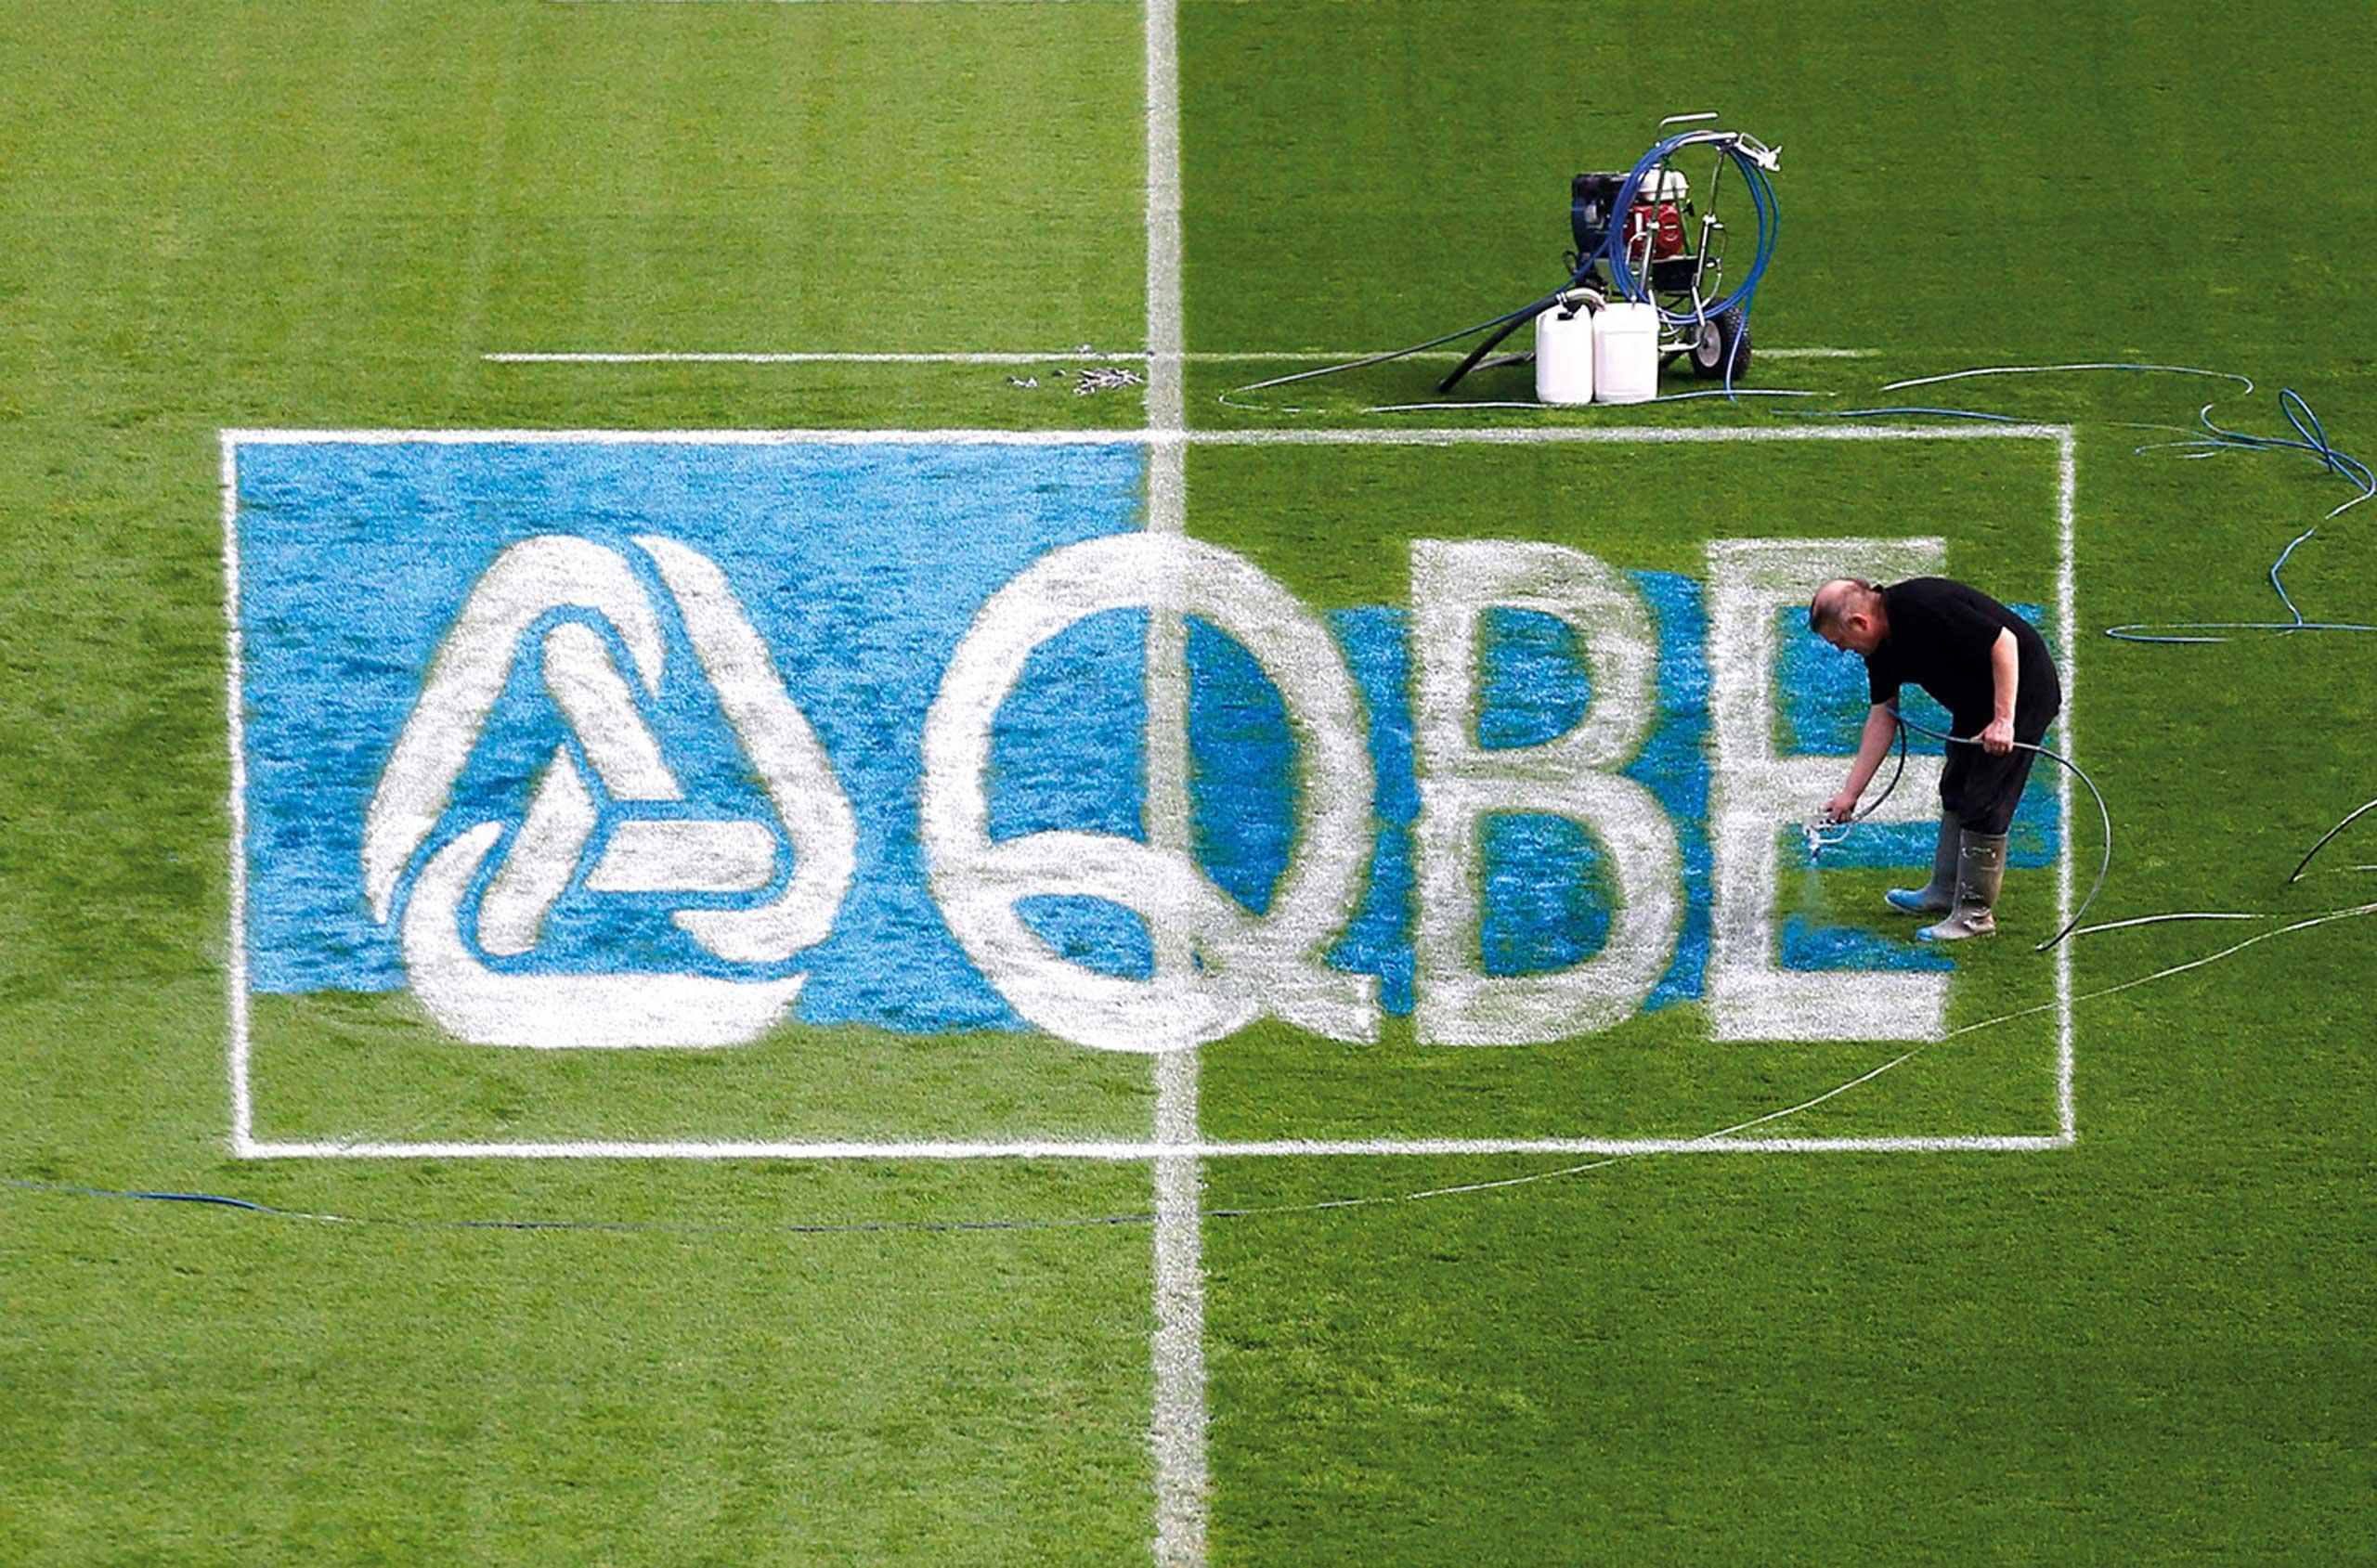 Glendale Creative QBE Internationals Rugby Pitch Design